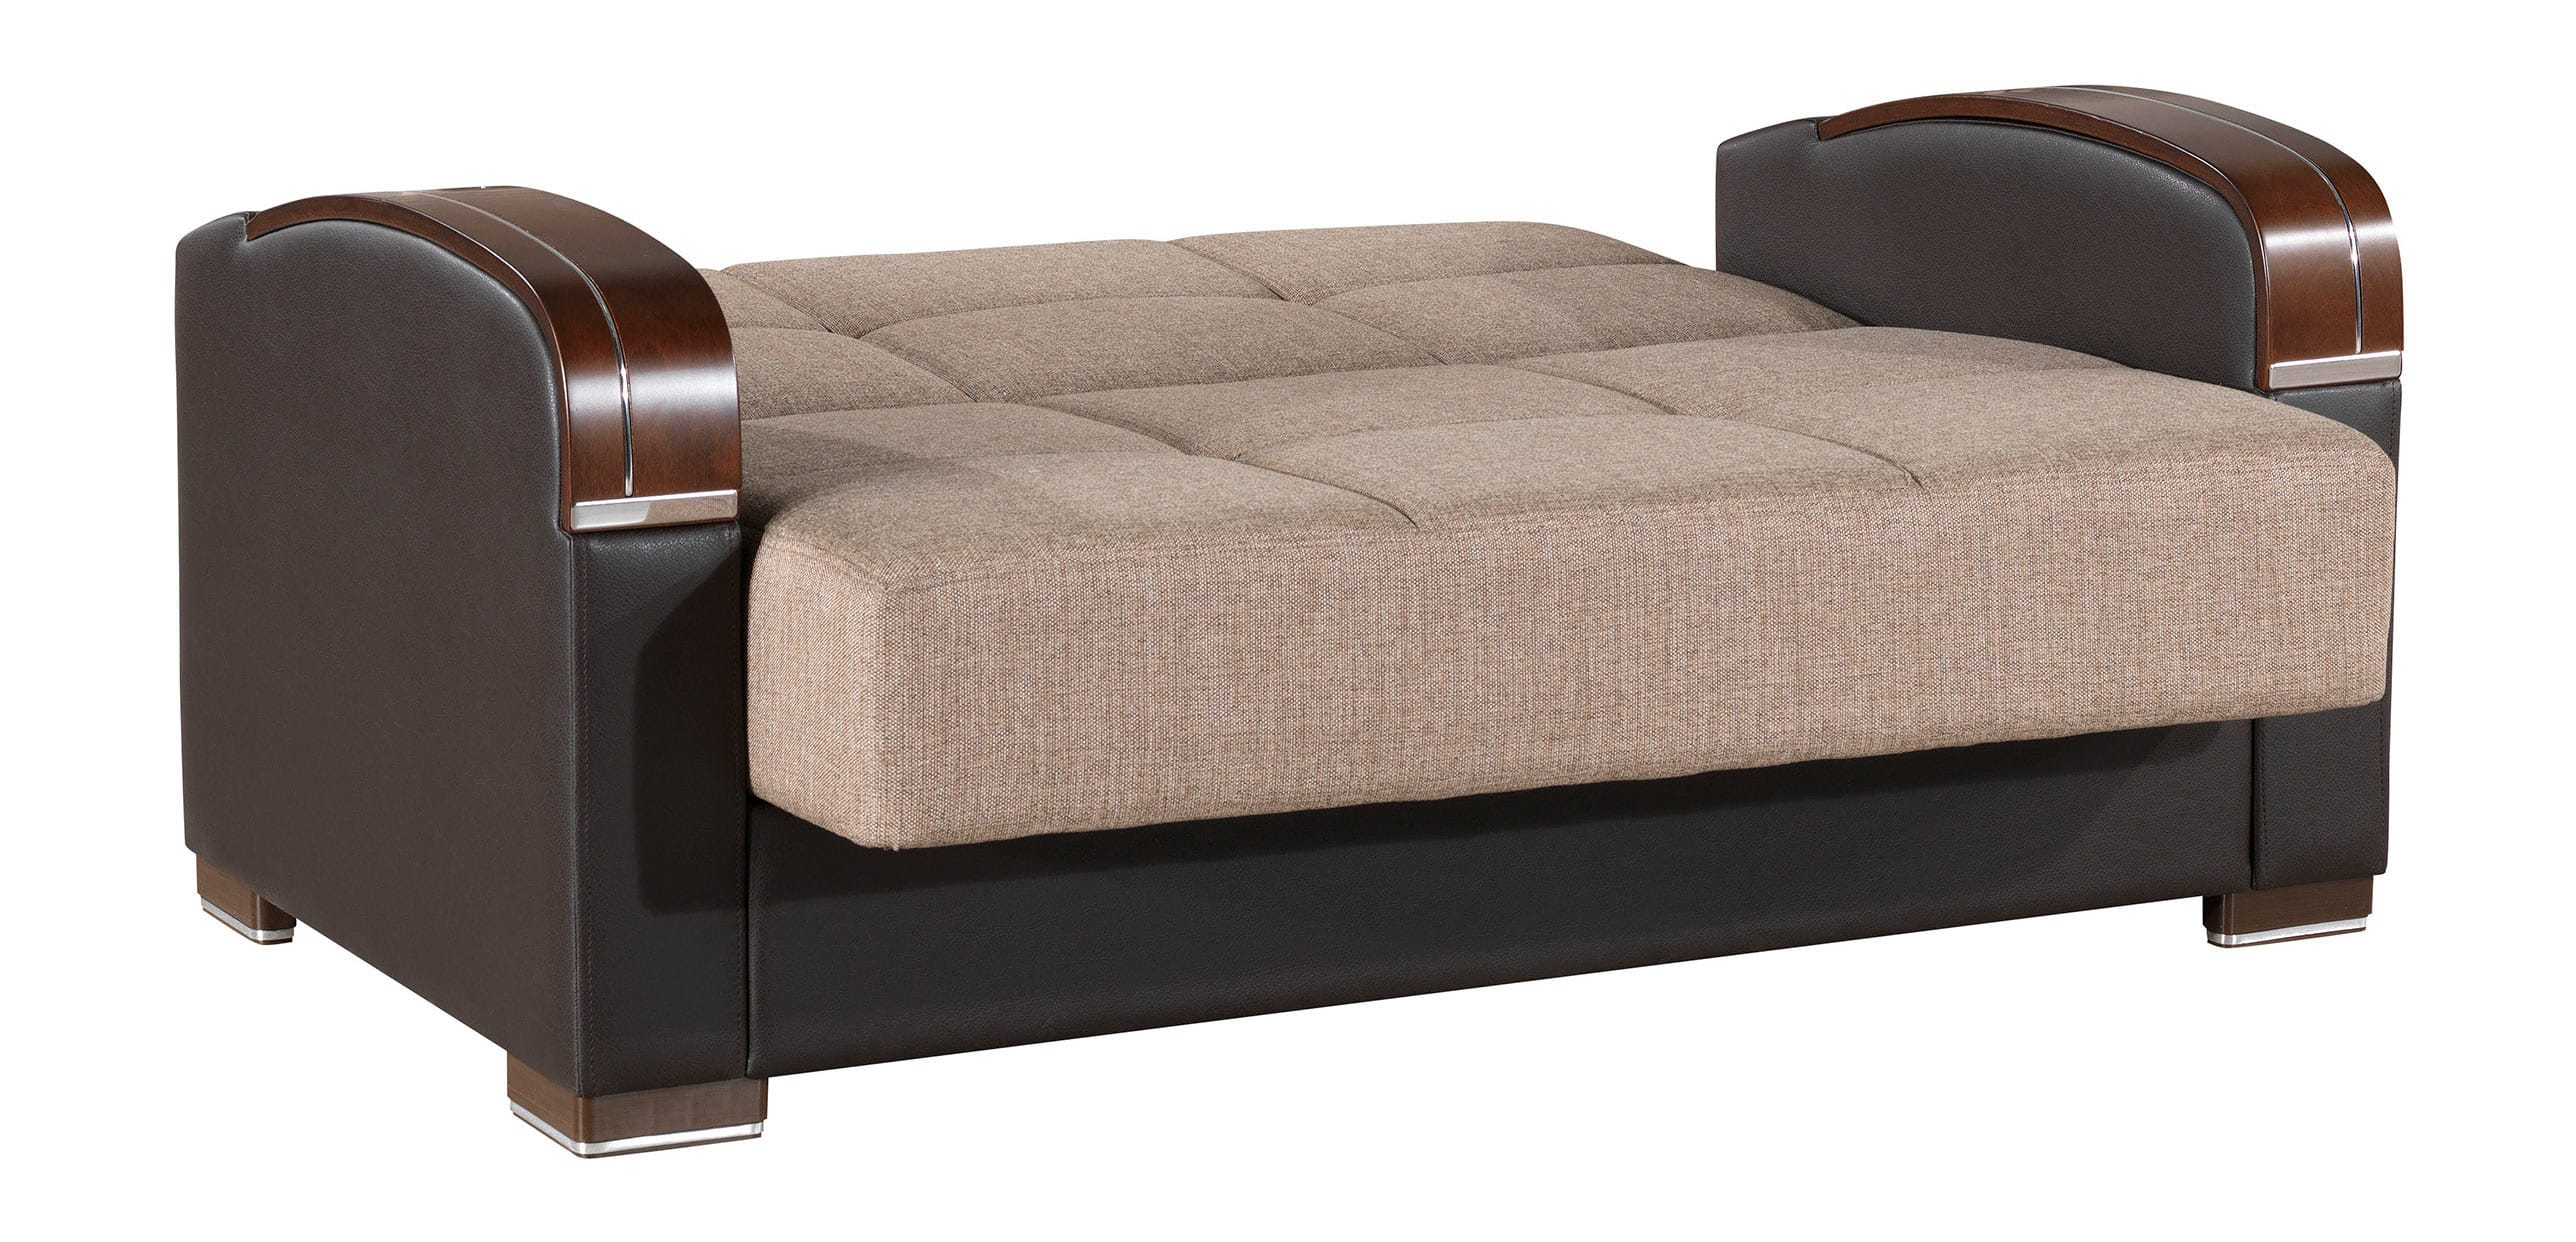 Admirable Mobimax Brown Loveseat By Casamode Inzonedesignstudio Interior Chair Design Inzonedesignstudiocom